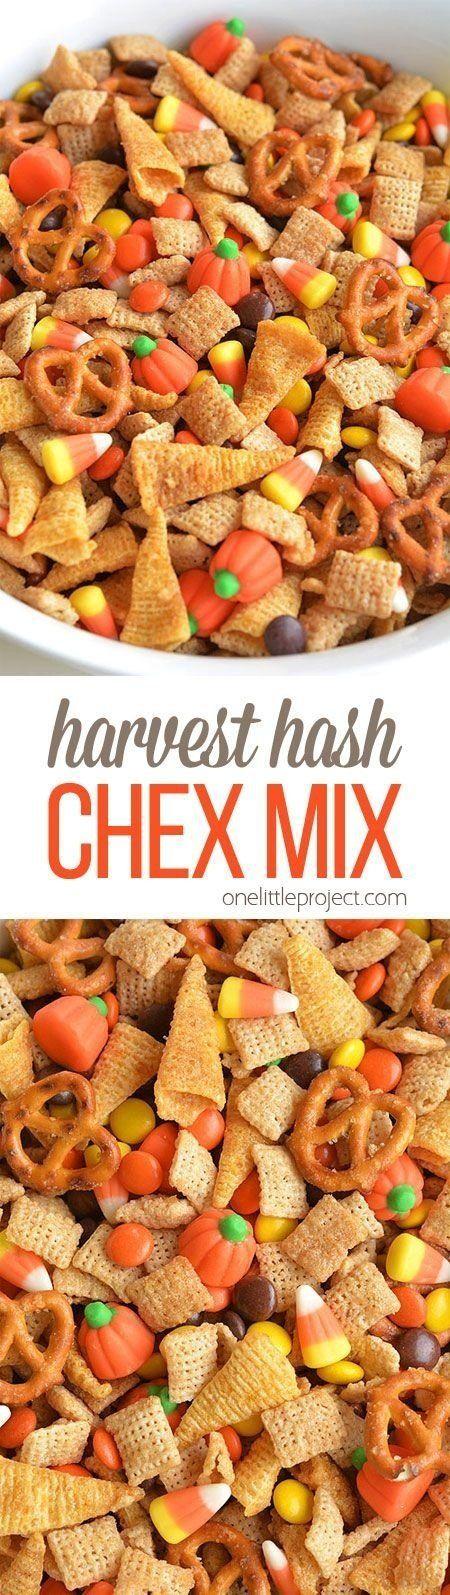 Ernte Hash Trail Mix   – Autumn – #Autumn #Ernte #Hash #Mix #Trail